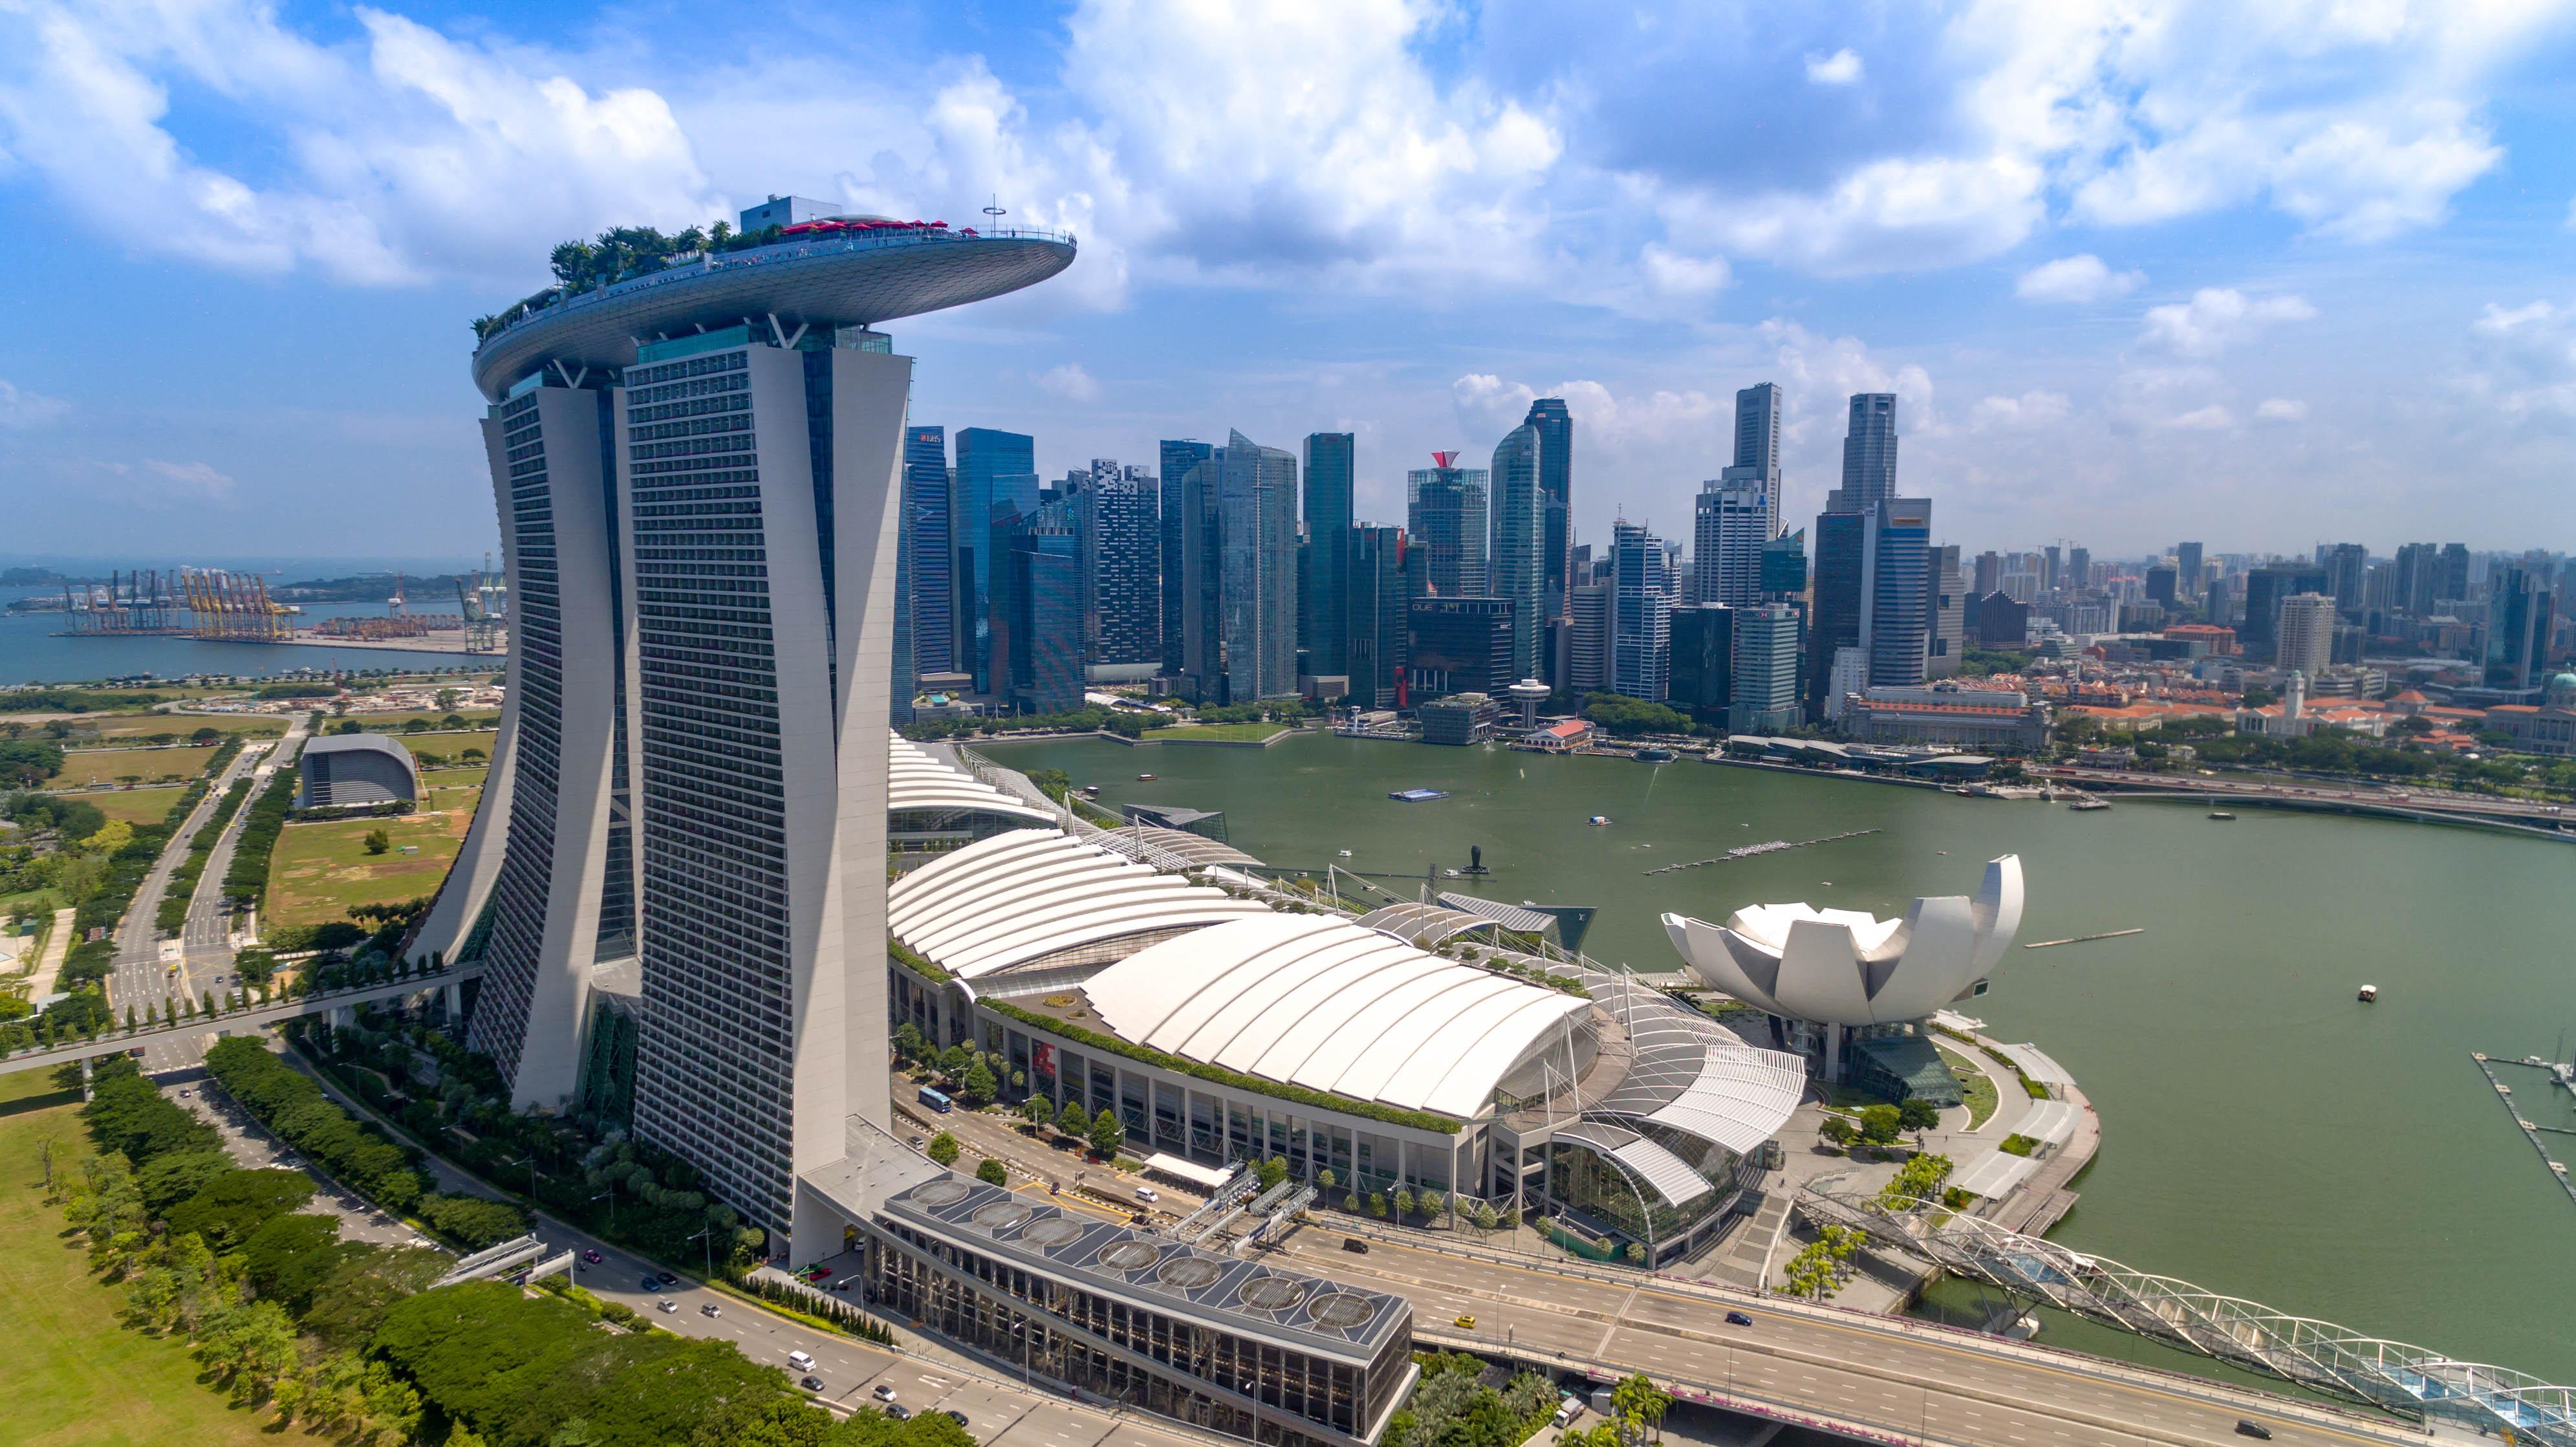 Vista aerea de Marina Bay Sands Singapur